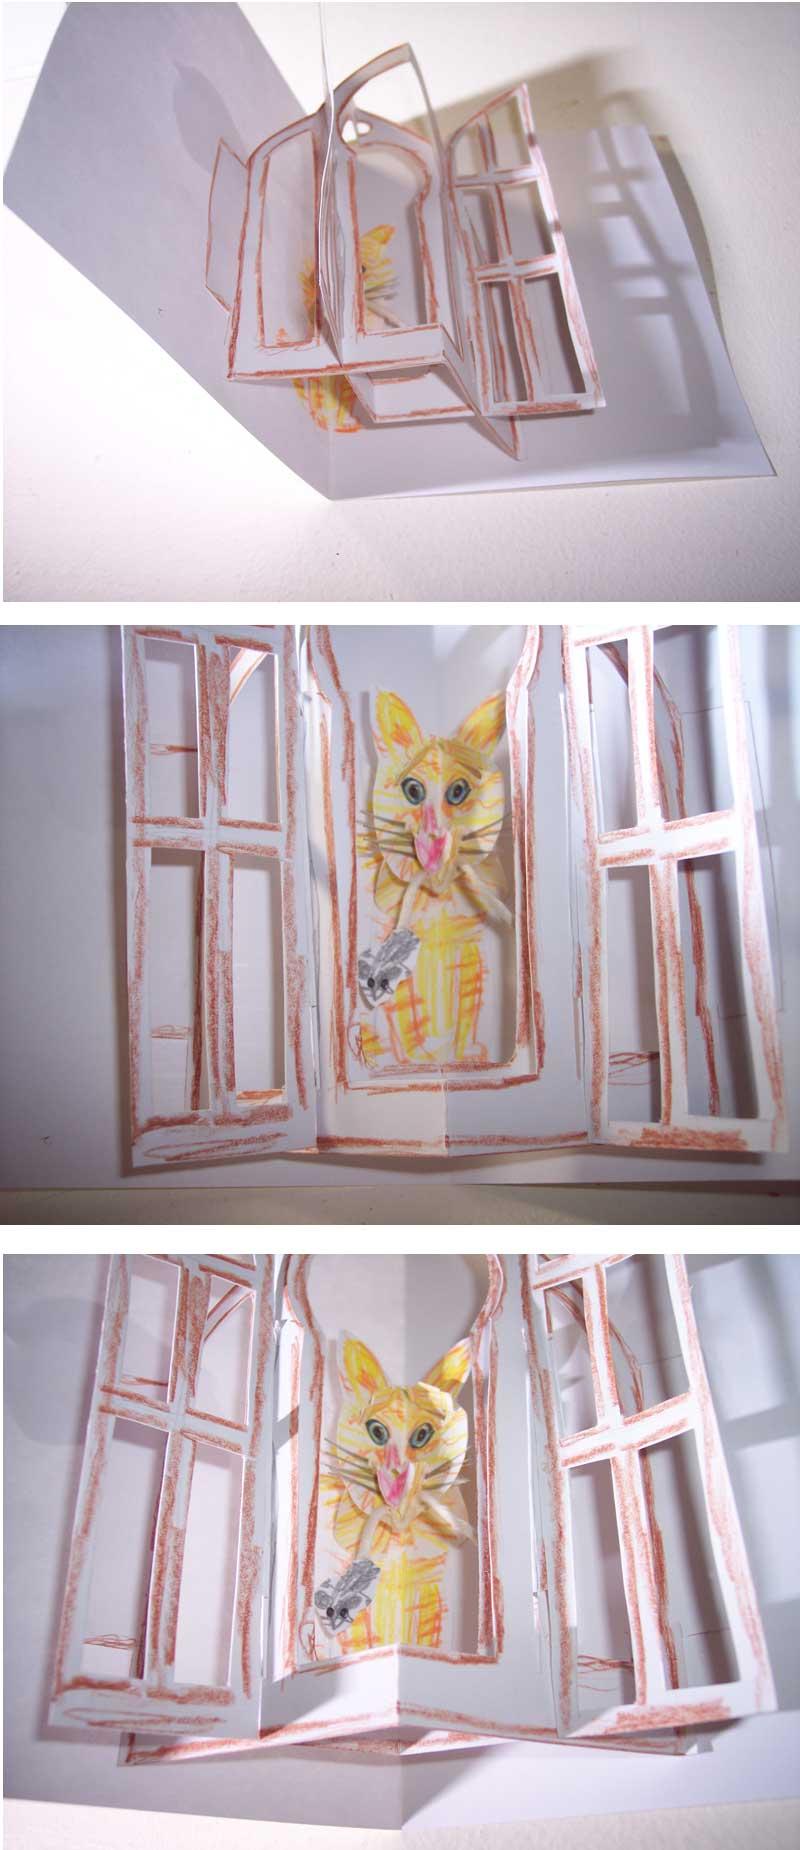 kitty pop-up card 7,8,9